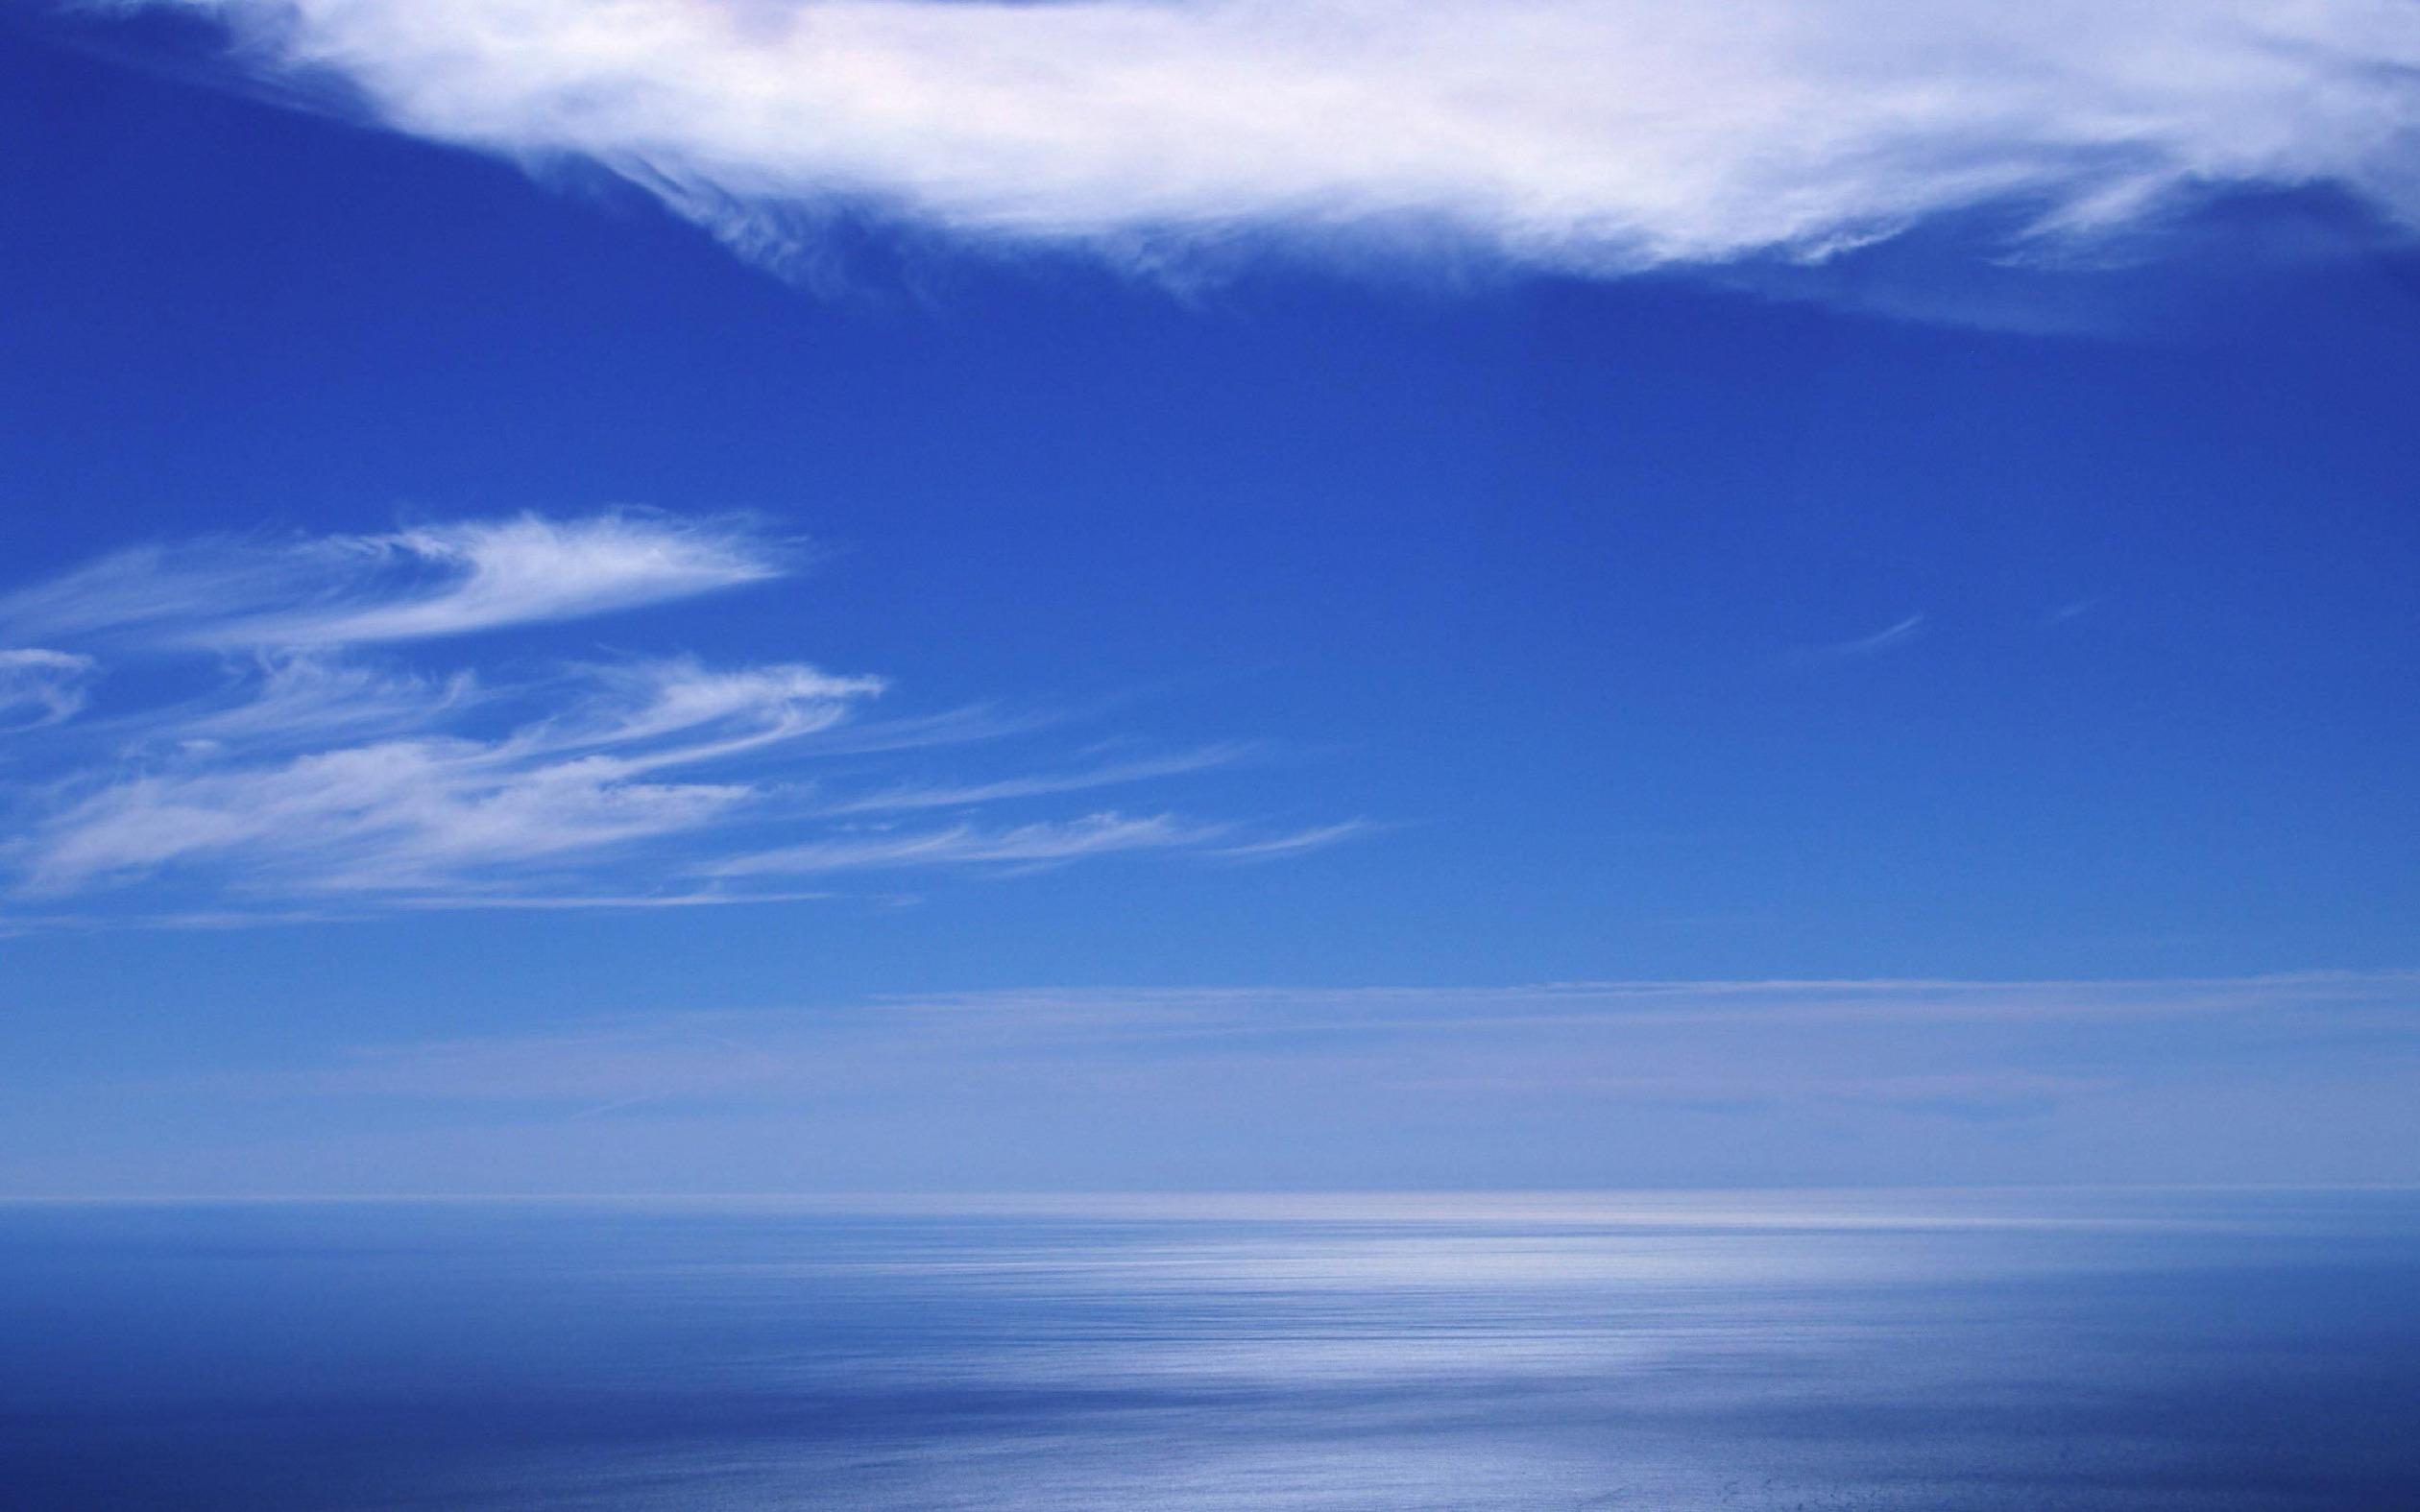 природа горизонт облака небо море nature horizon clouds the sky sea  № 2761309 без смс